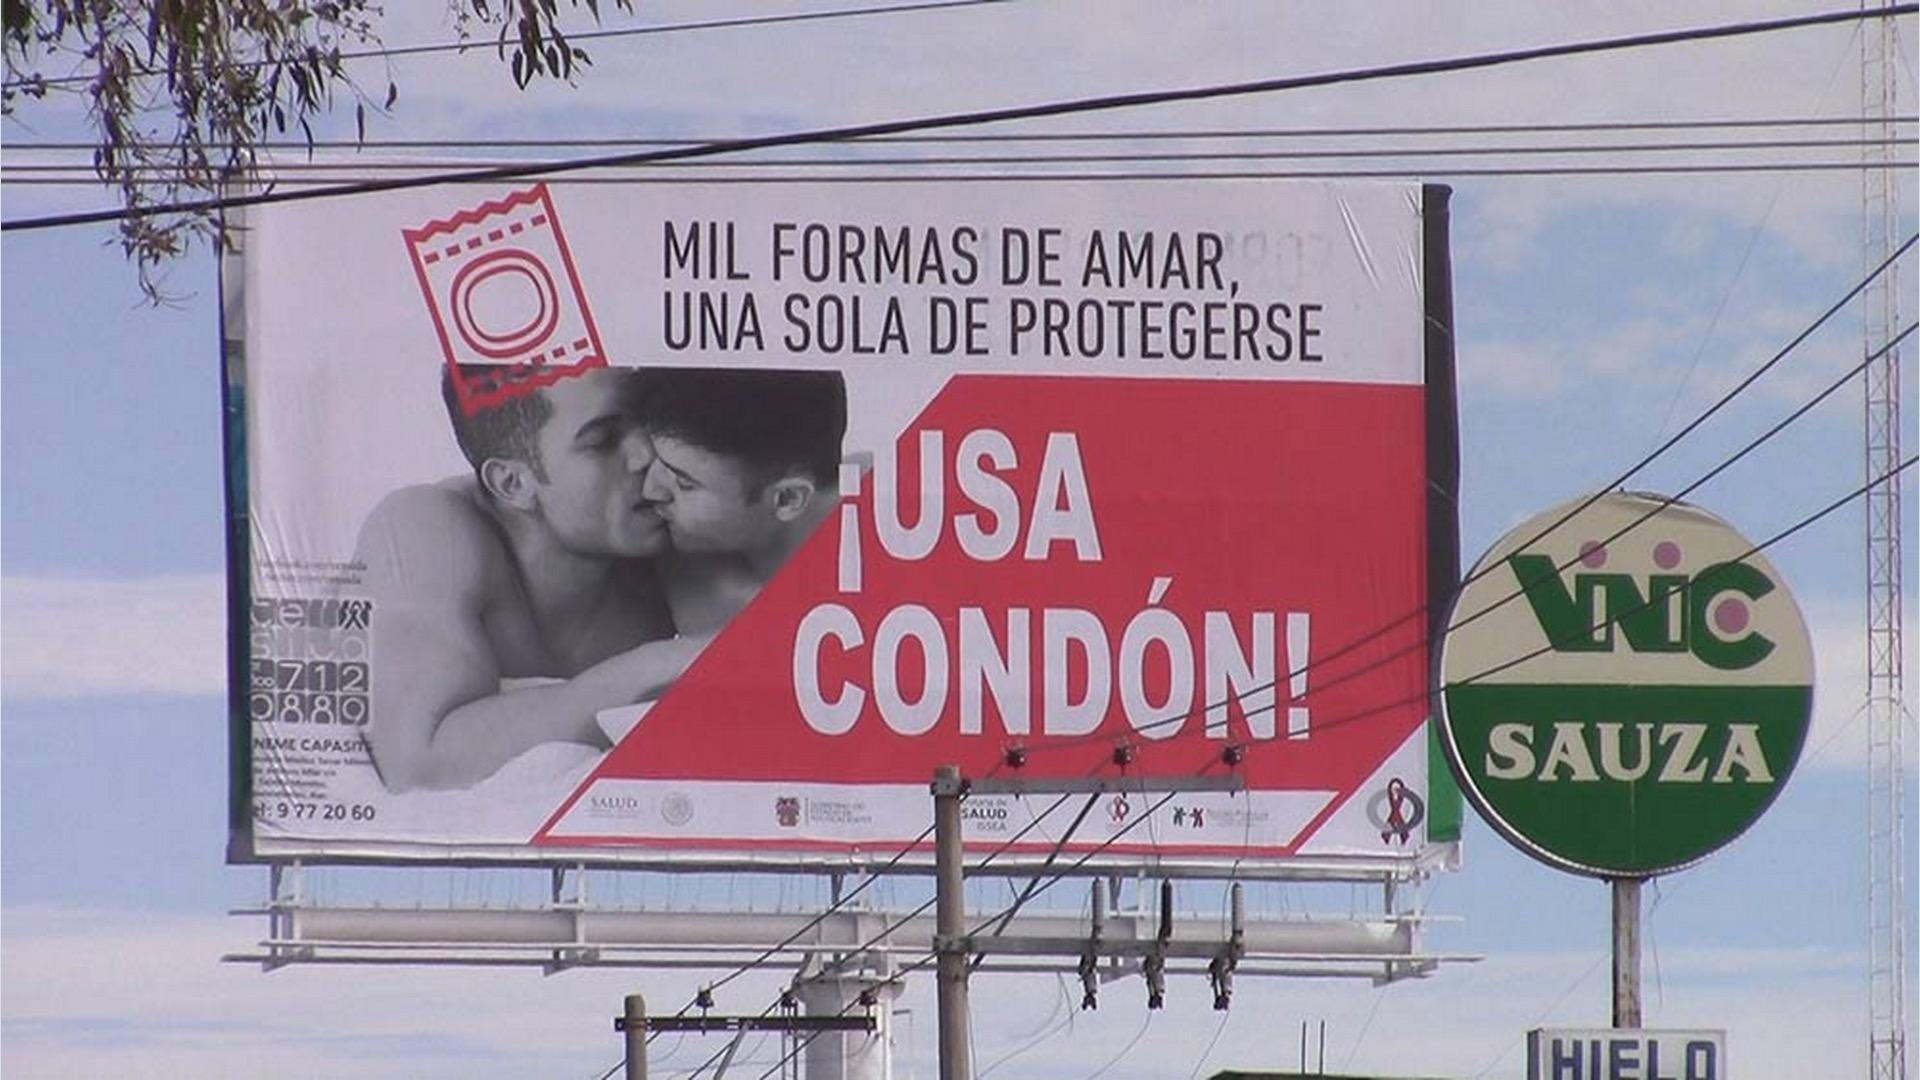 CONDON BESO HOMBRES POLEMICA